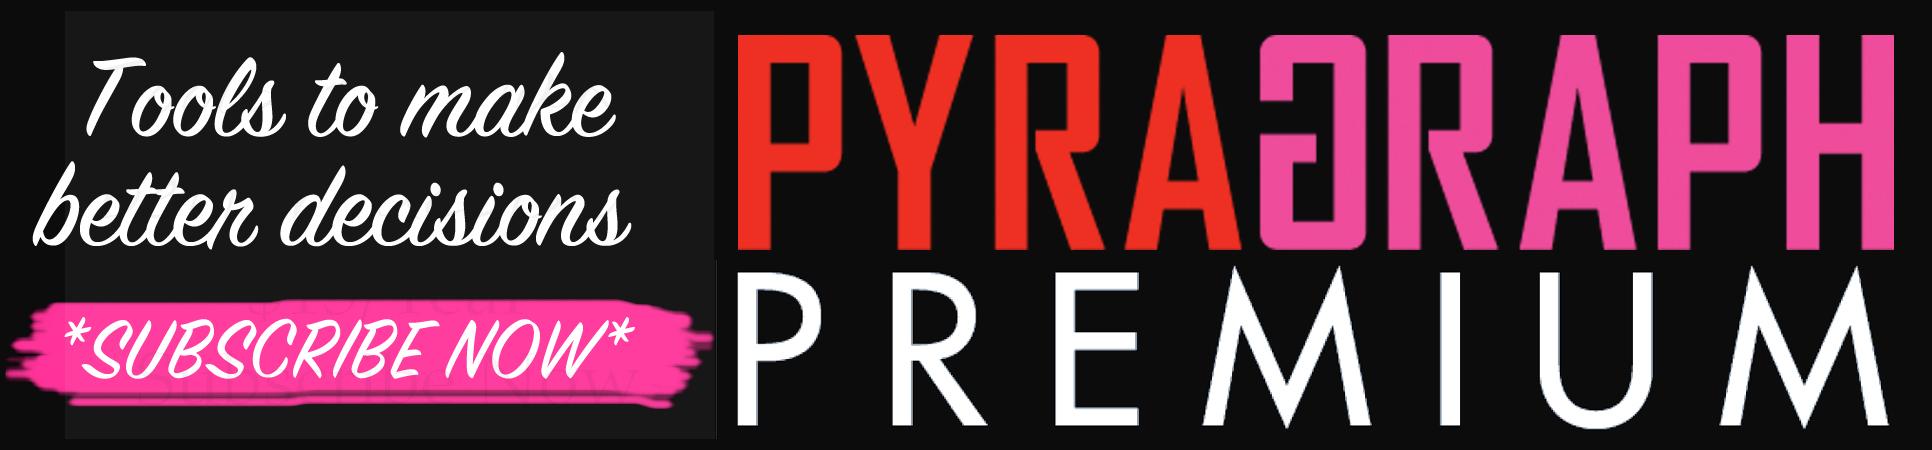 Pyragraph Premium